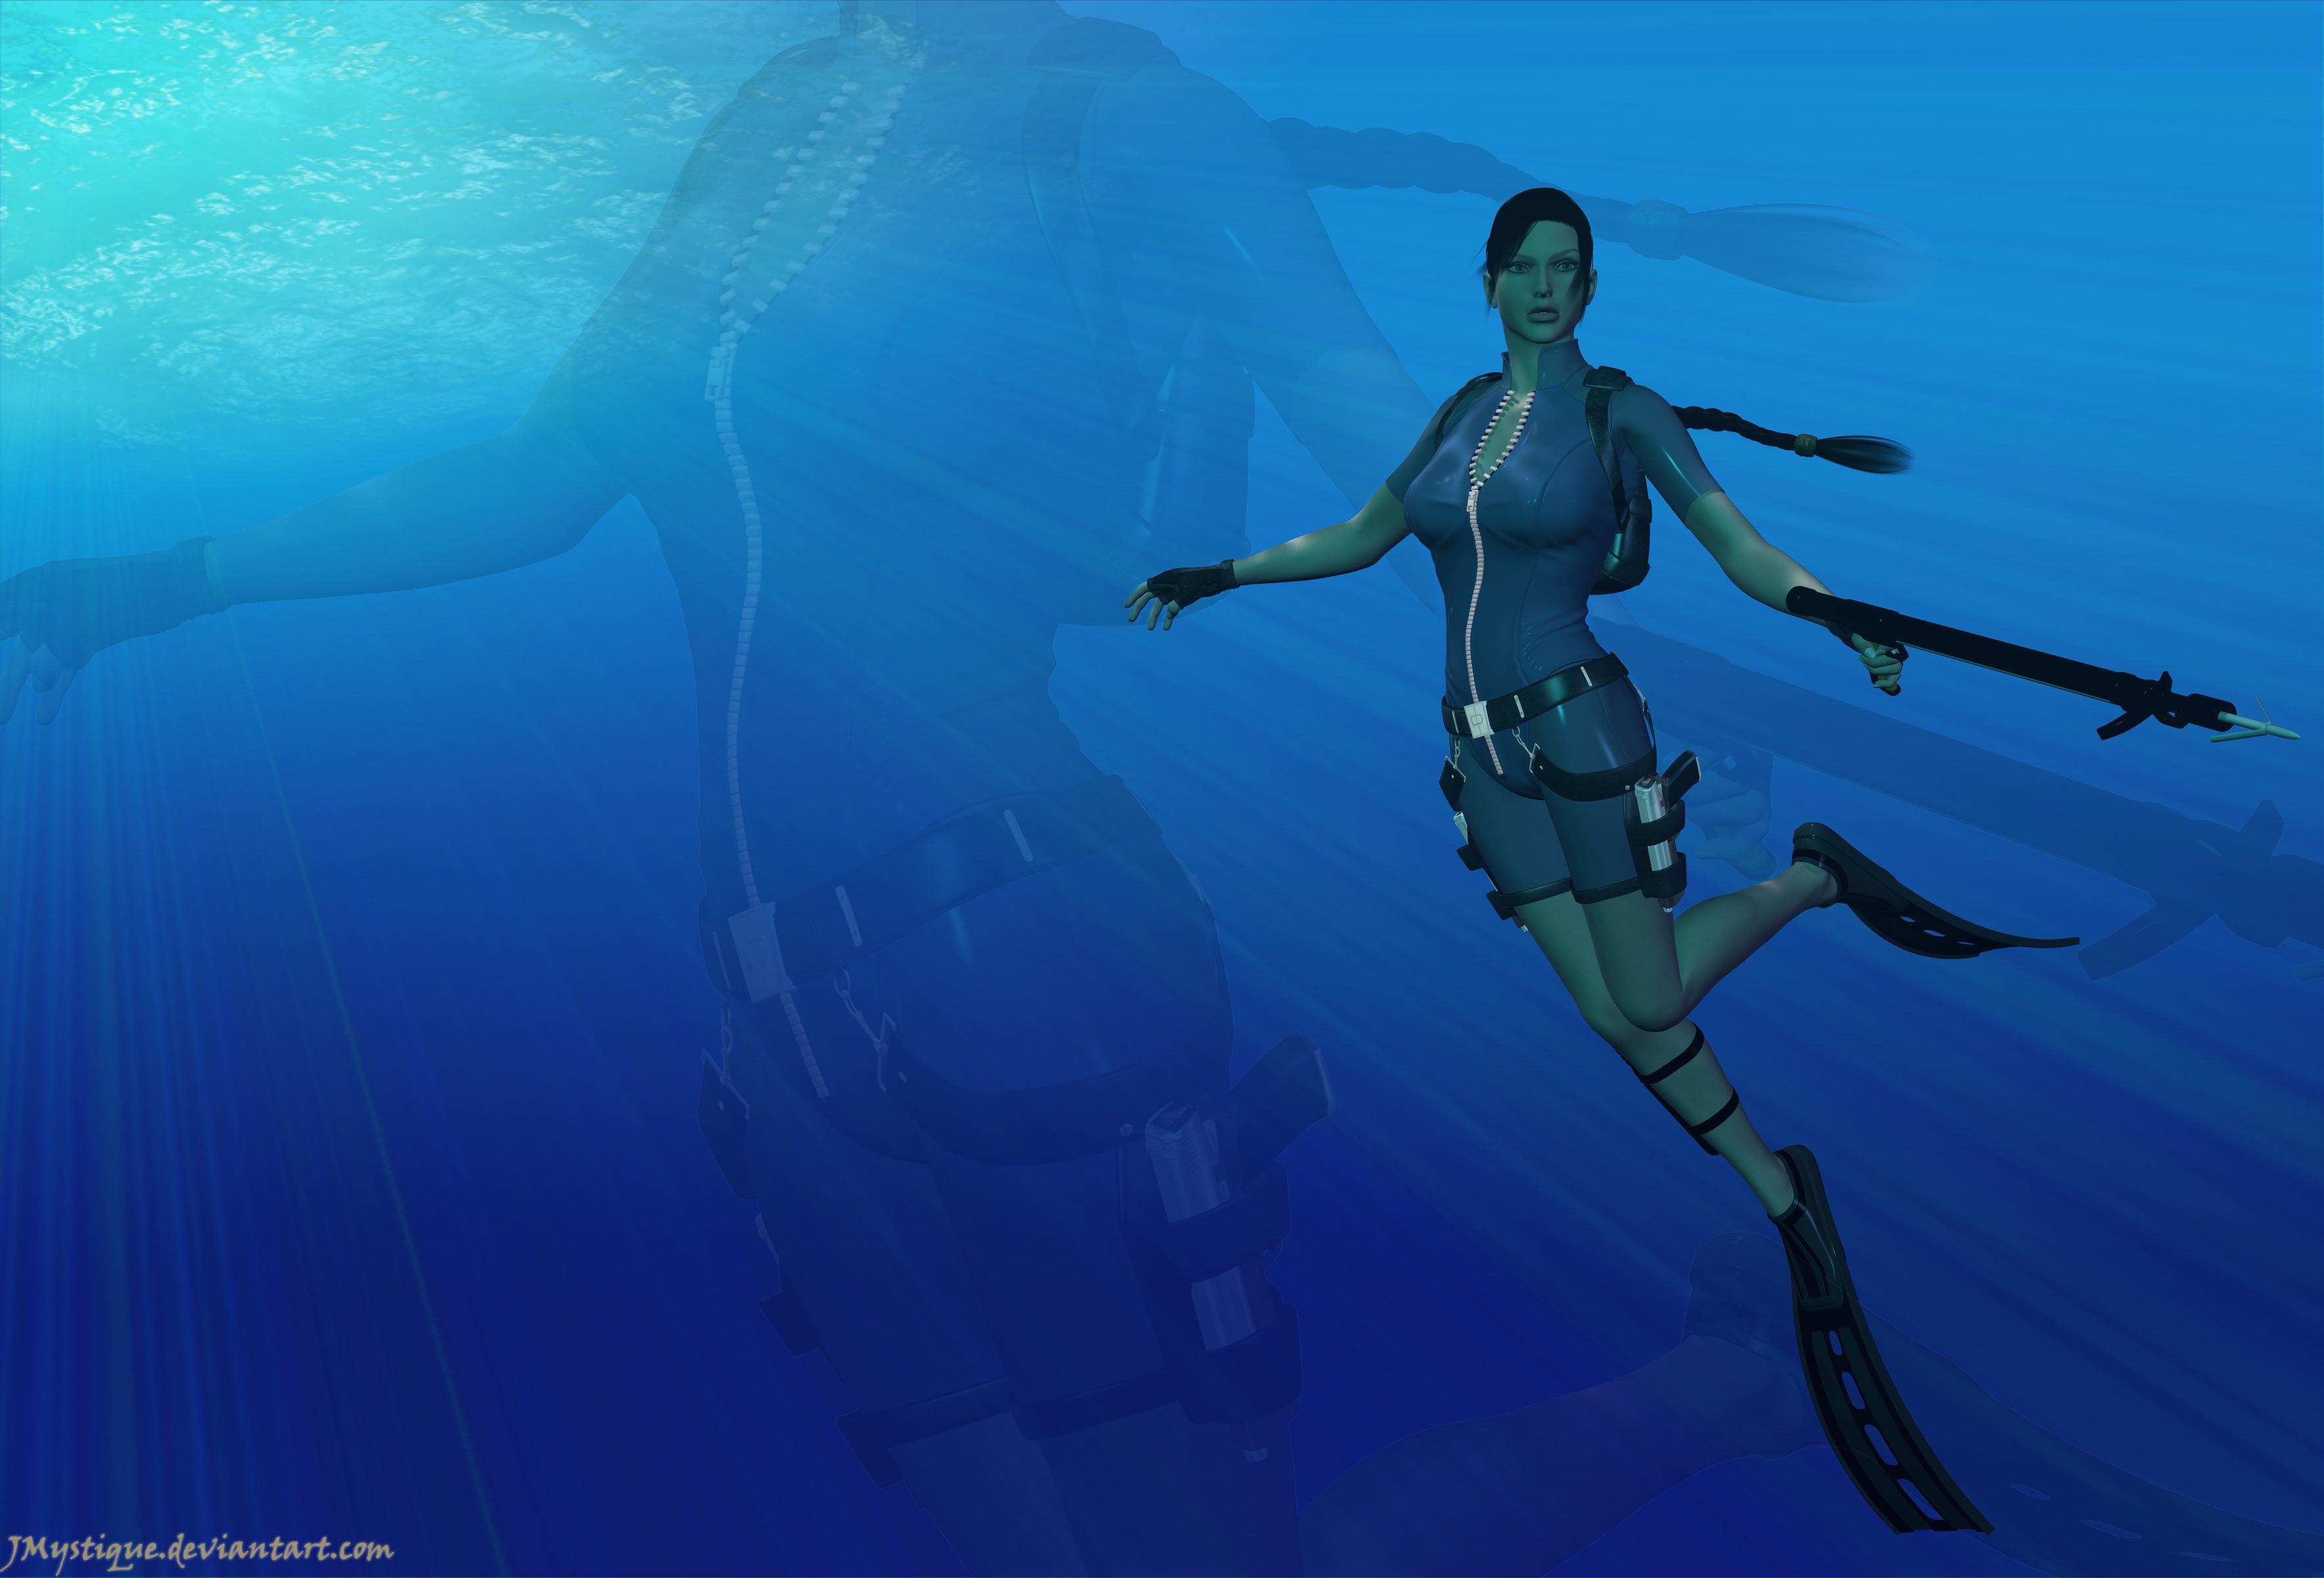 underwater cartoon wallpaper - photo #22